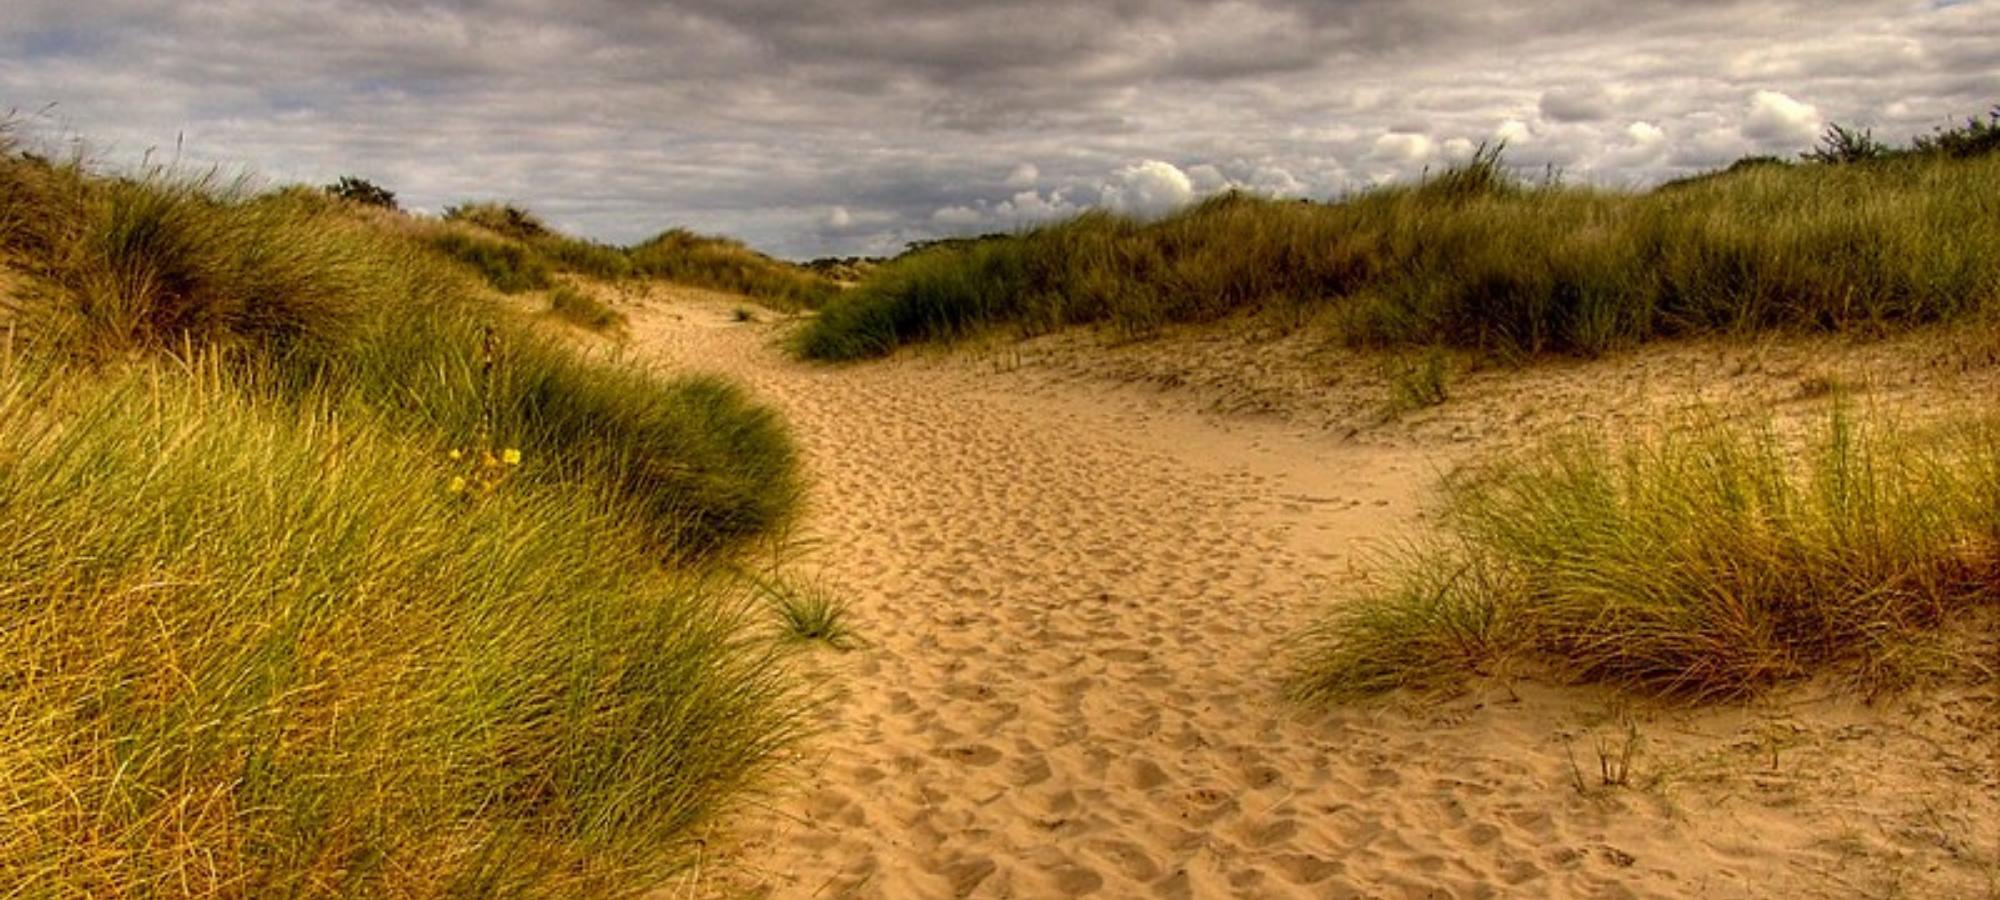 Sandy walking trail lined by grassy reed plants near De Panne beach in Nature Reserve of Westhoek, Belgium